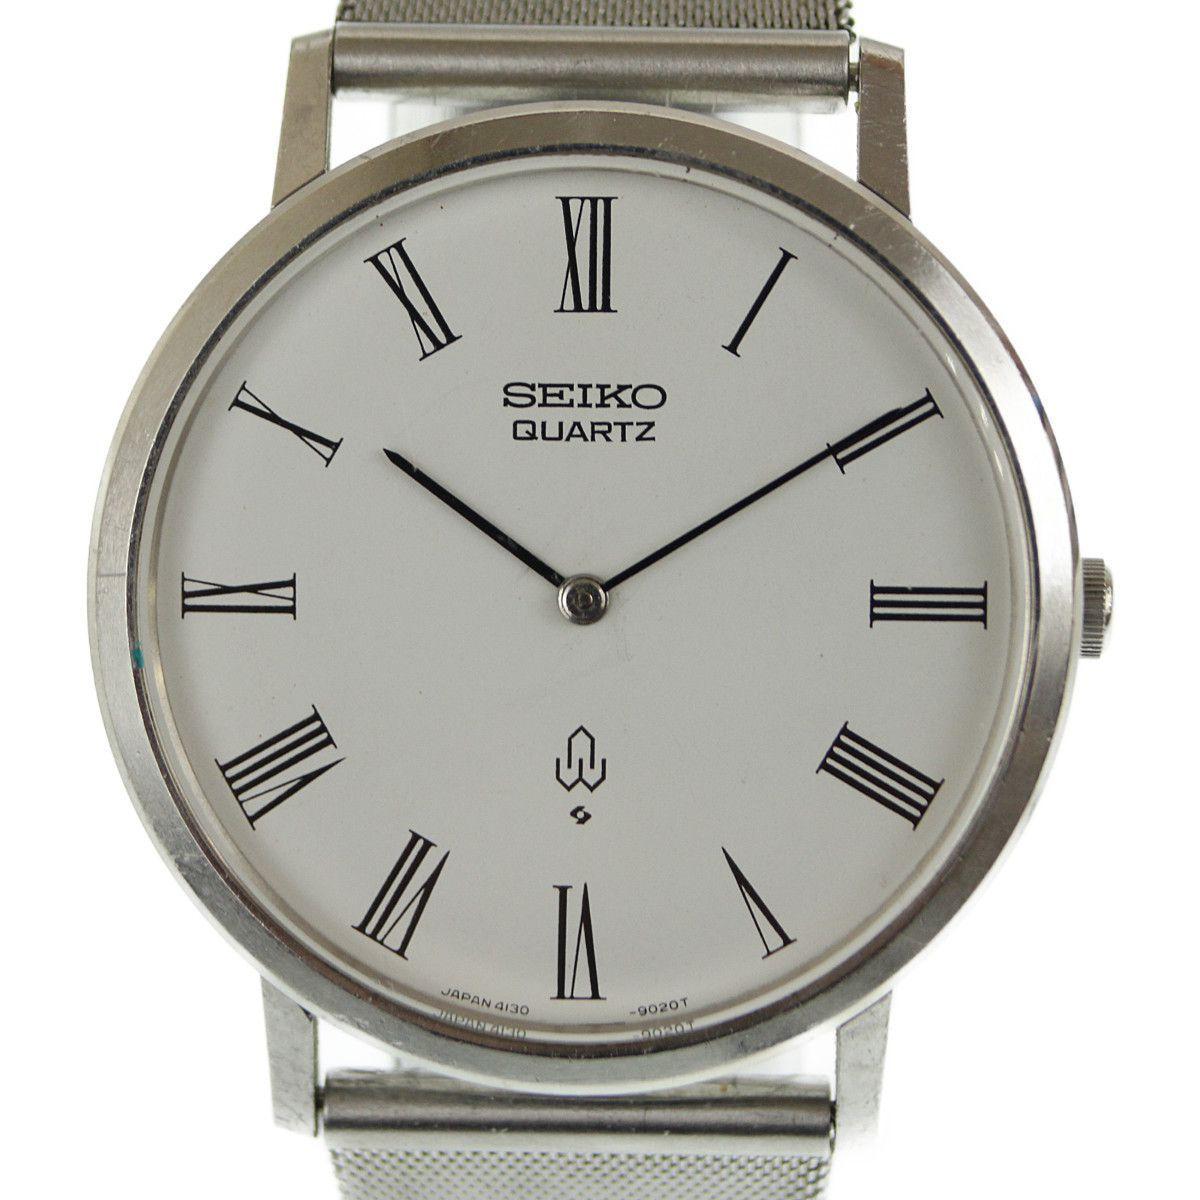 94b47e23bdee 1円~ SEIKO セイコー シャリオ メンズ腕時計 クオーツ 4130-9001 社外ベルト 237976の